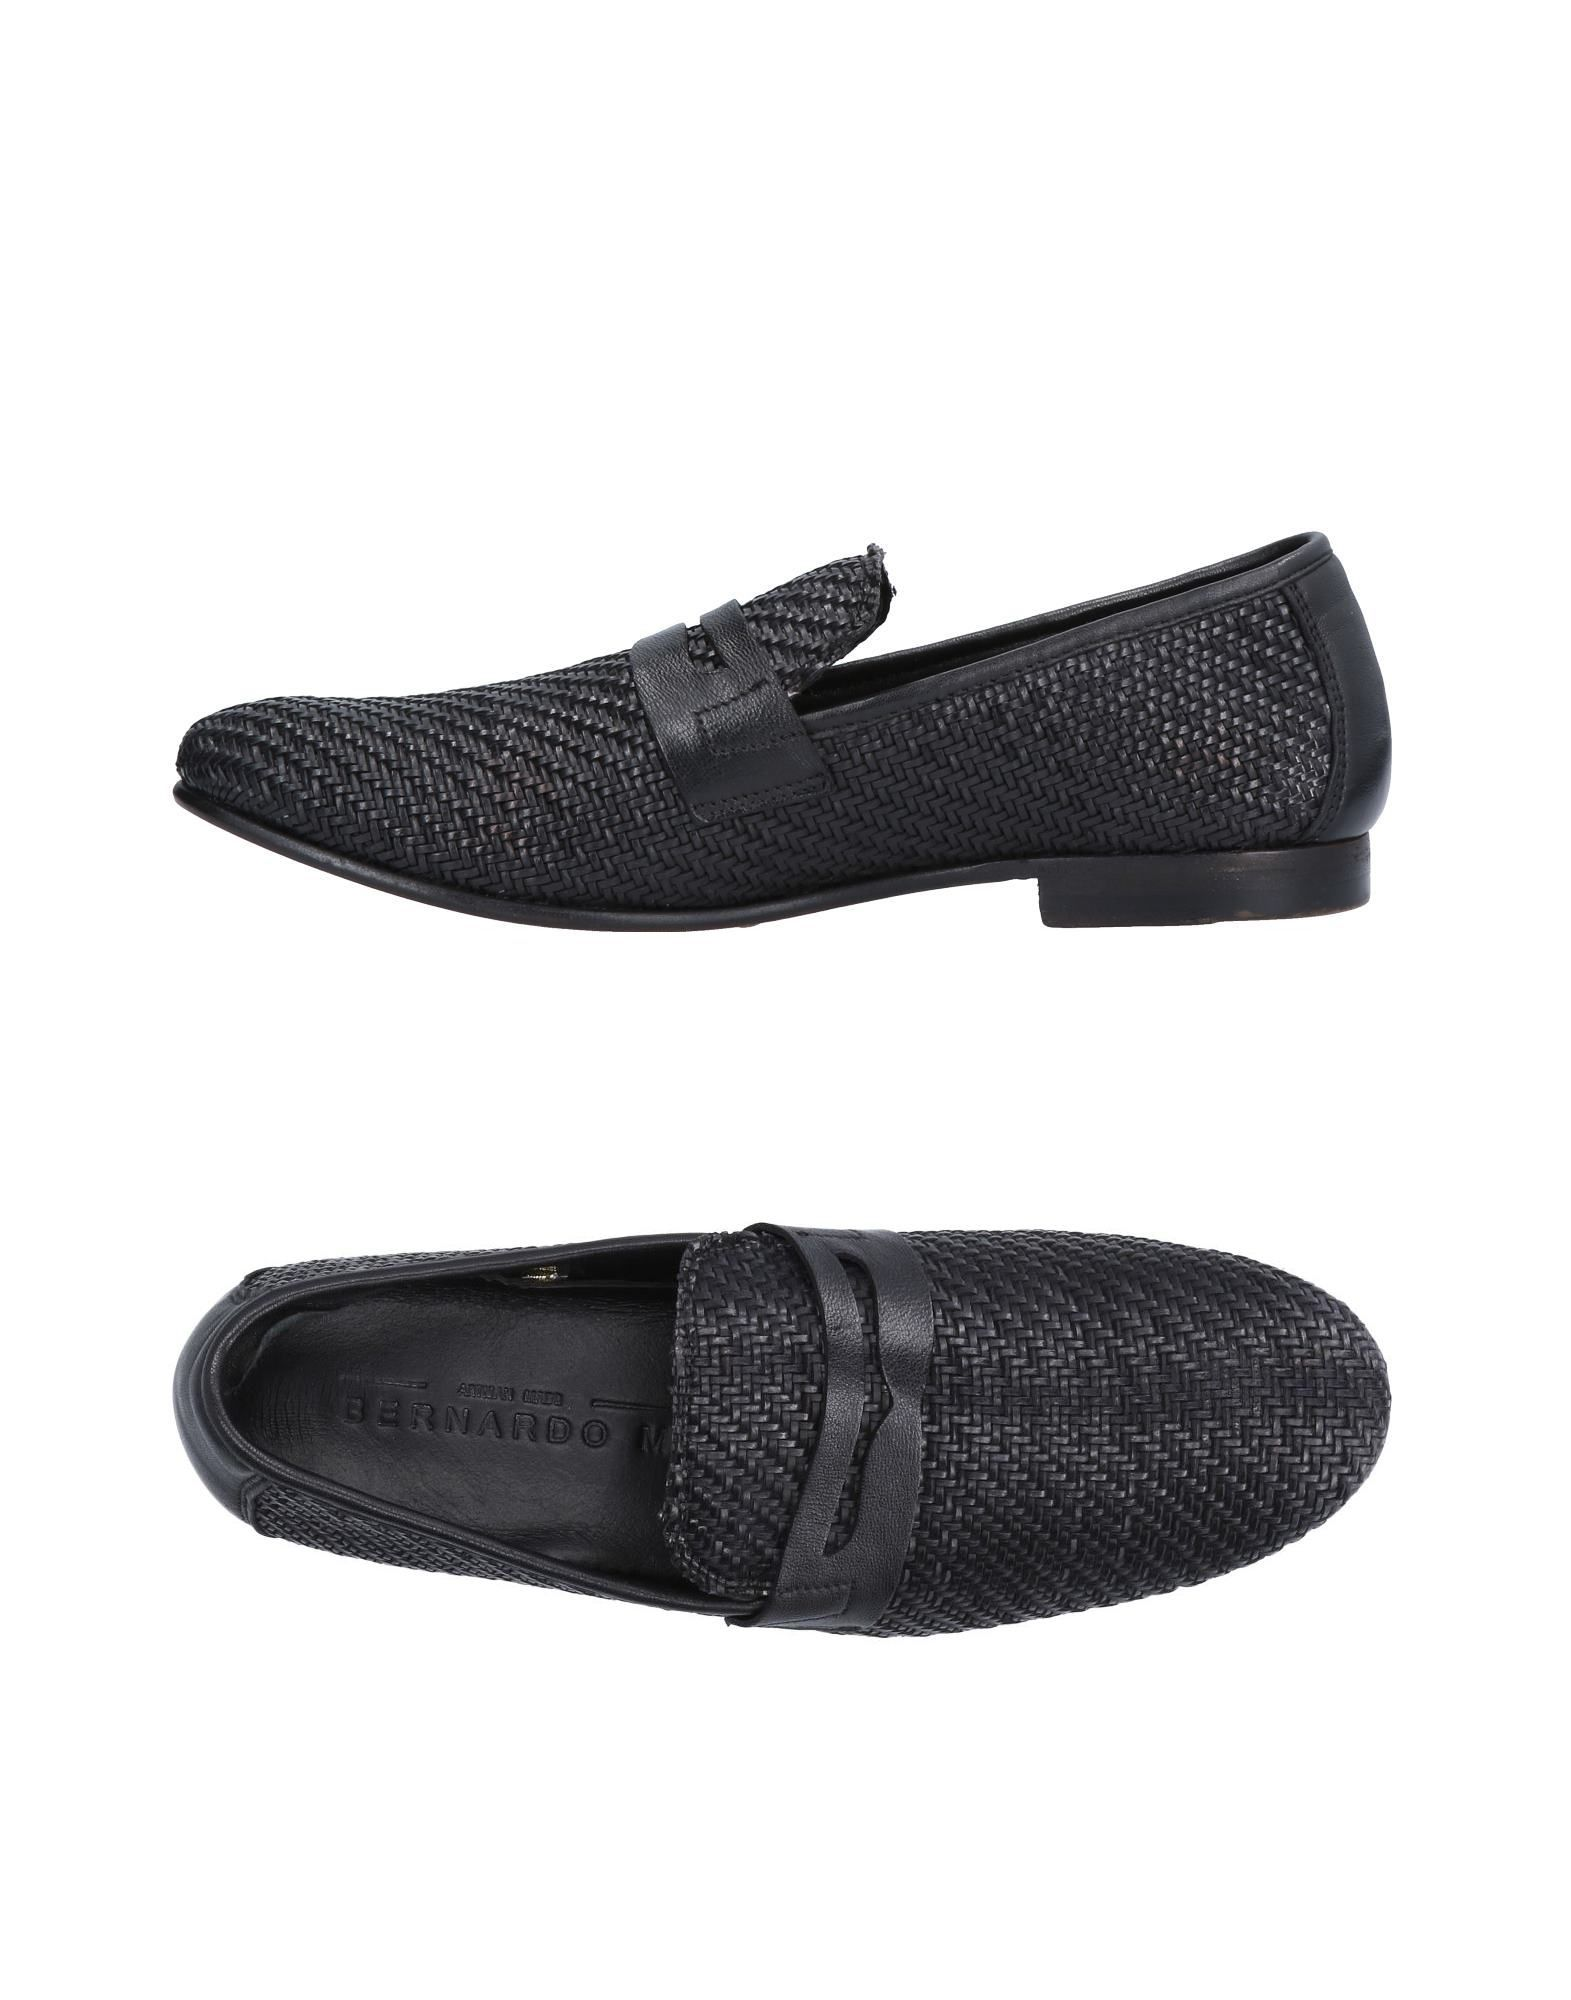 Rabatt M echte Schuhe Bernardo M Rabatt Mokassins Herren  11520330DK 5412a7